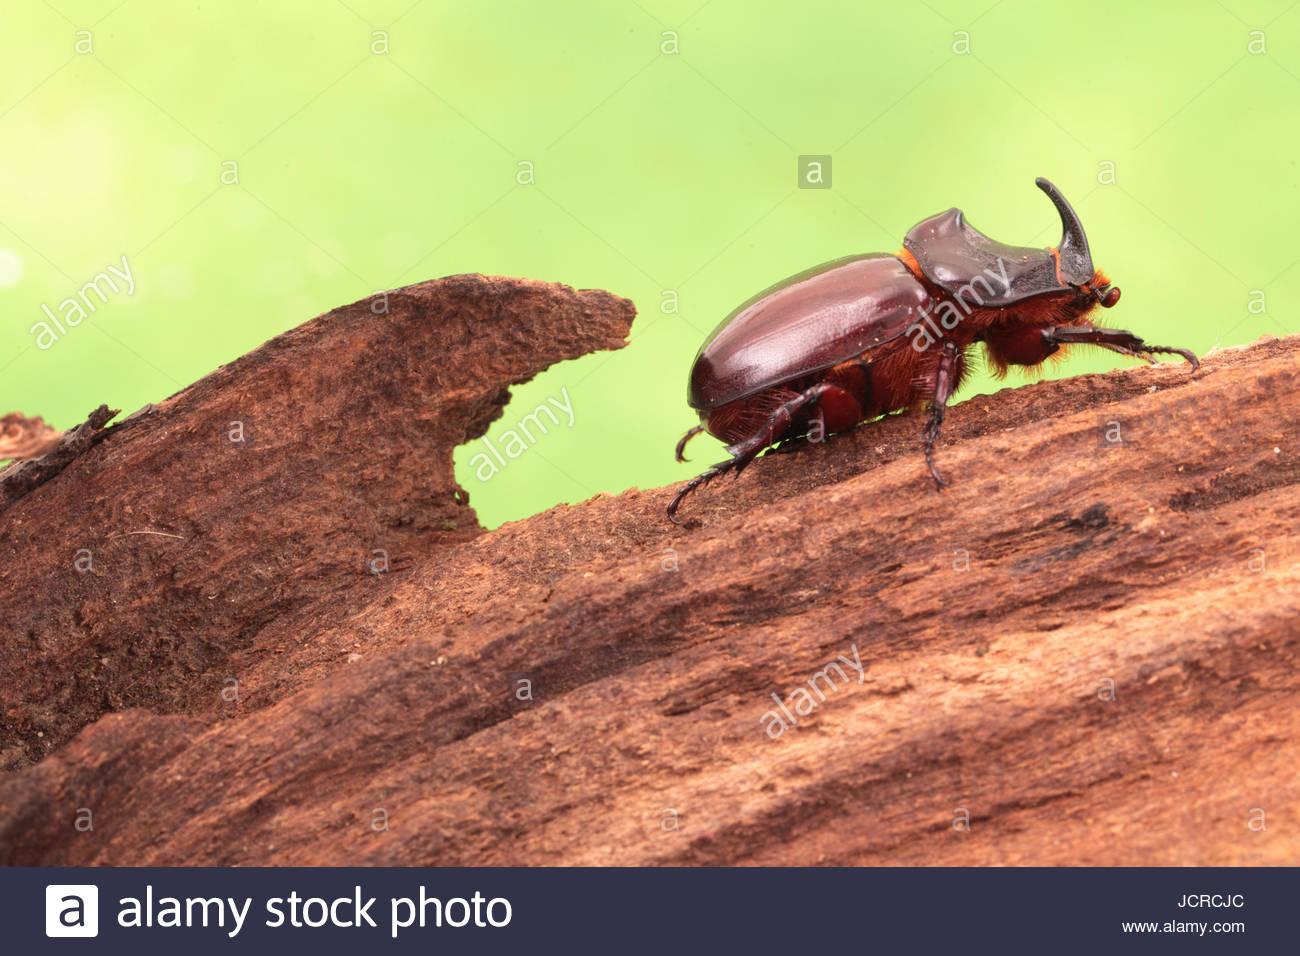 Portrait of an European rhinoceros beetle, Oryctes nasicornis, a large flying beetle belonging to the family Dynastinae. - Stock Image